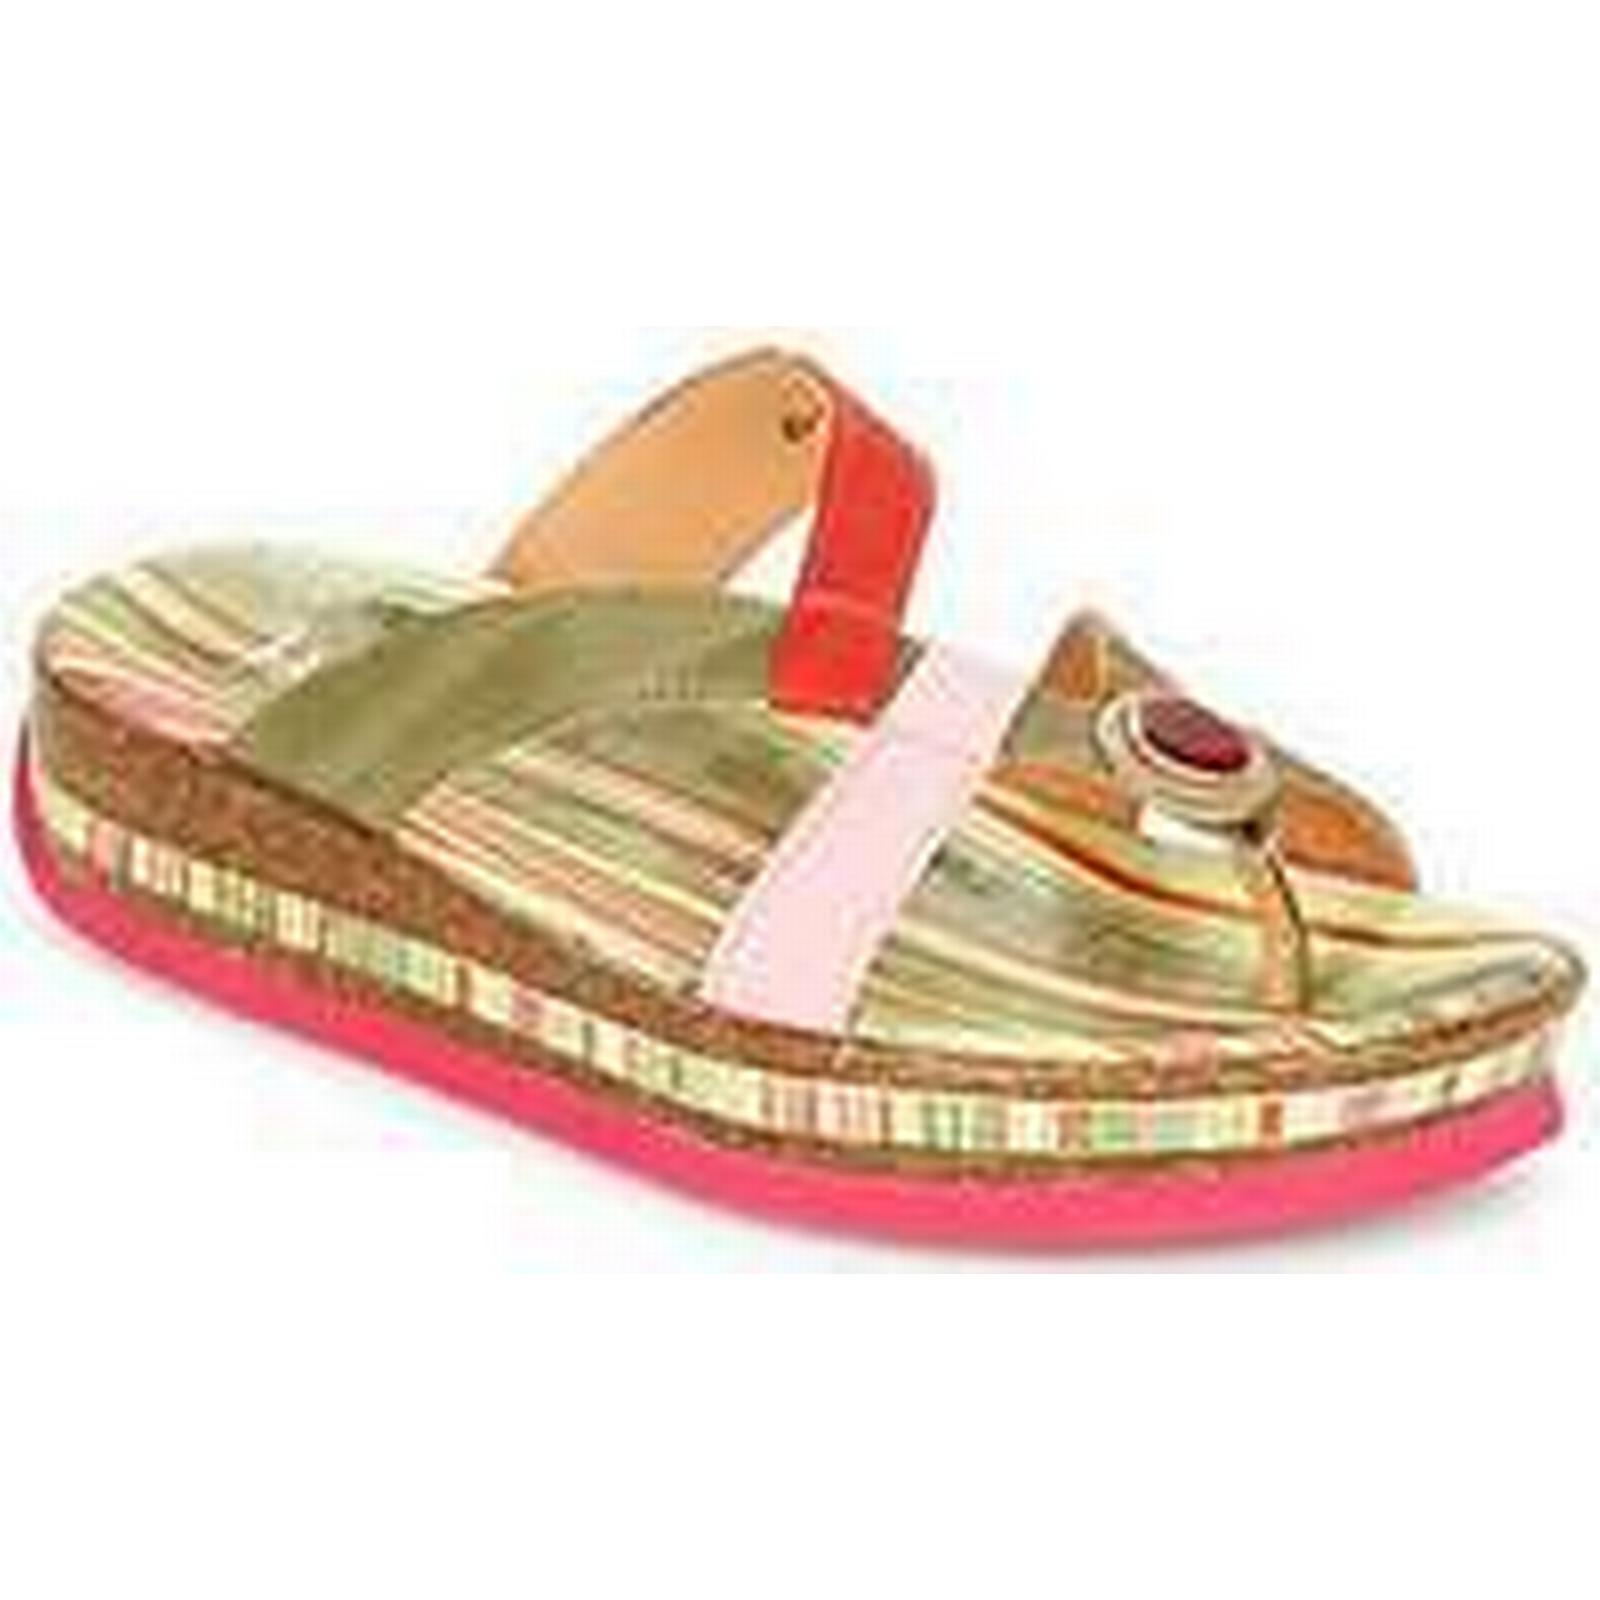 Spartoo.co.uk Think AQAZA (Shoes) women's Flip flops / Sandals (Shoes) AQAZA in Multicolour faf807